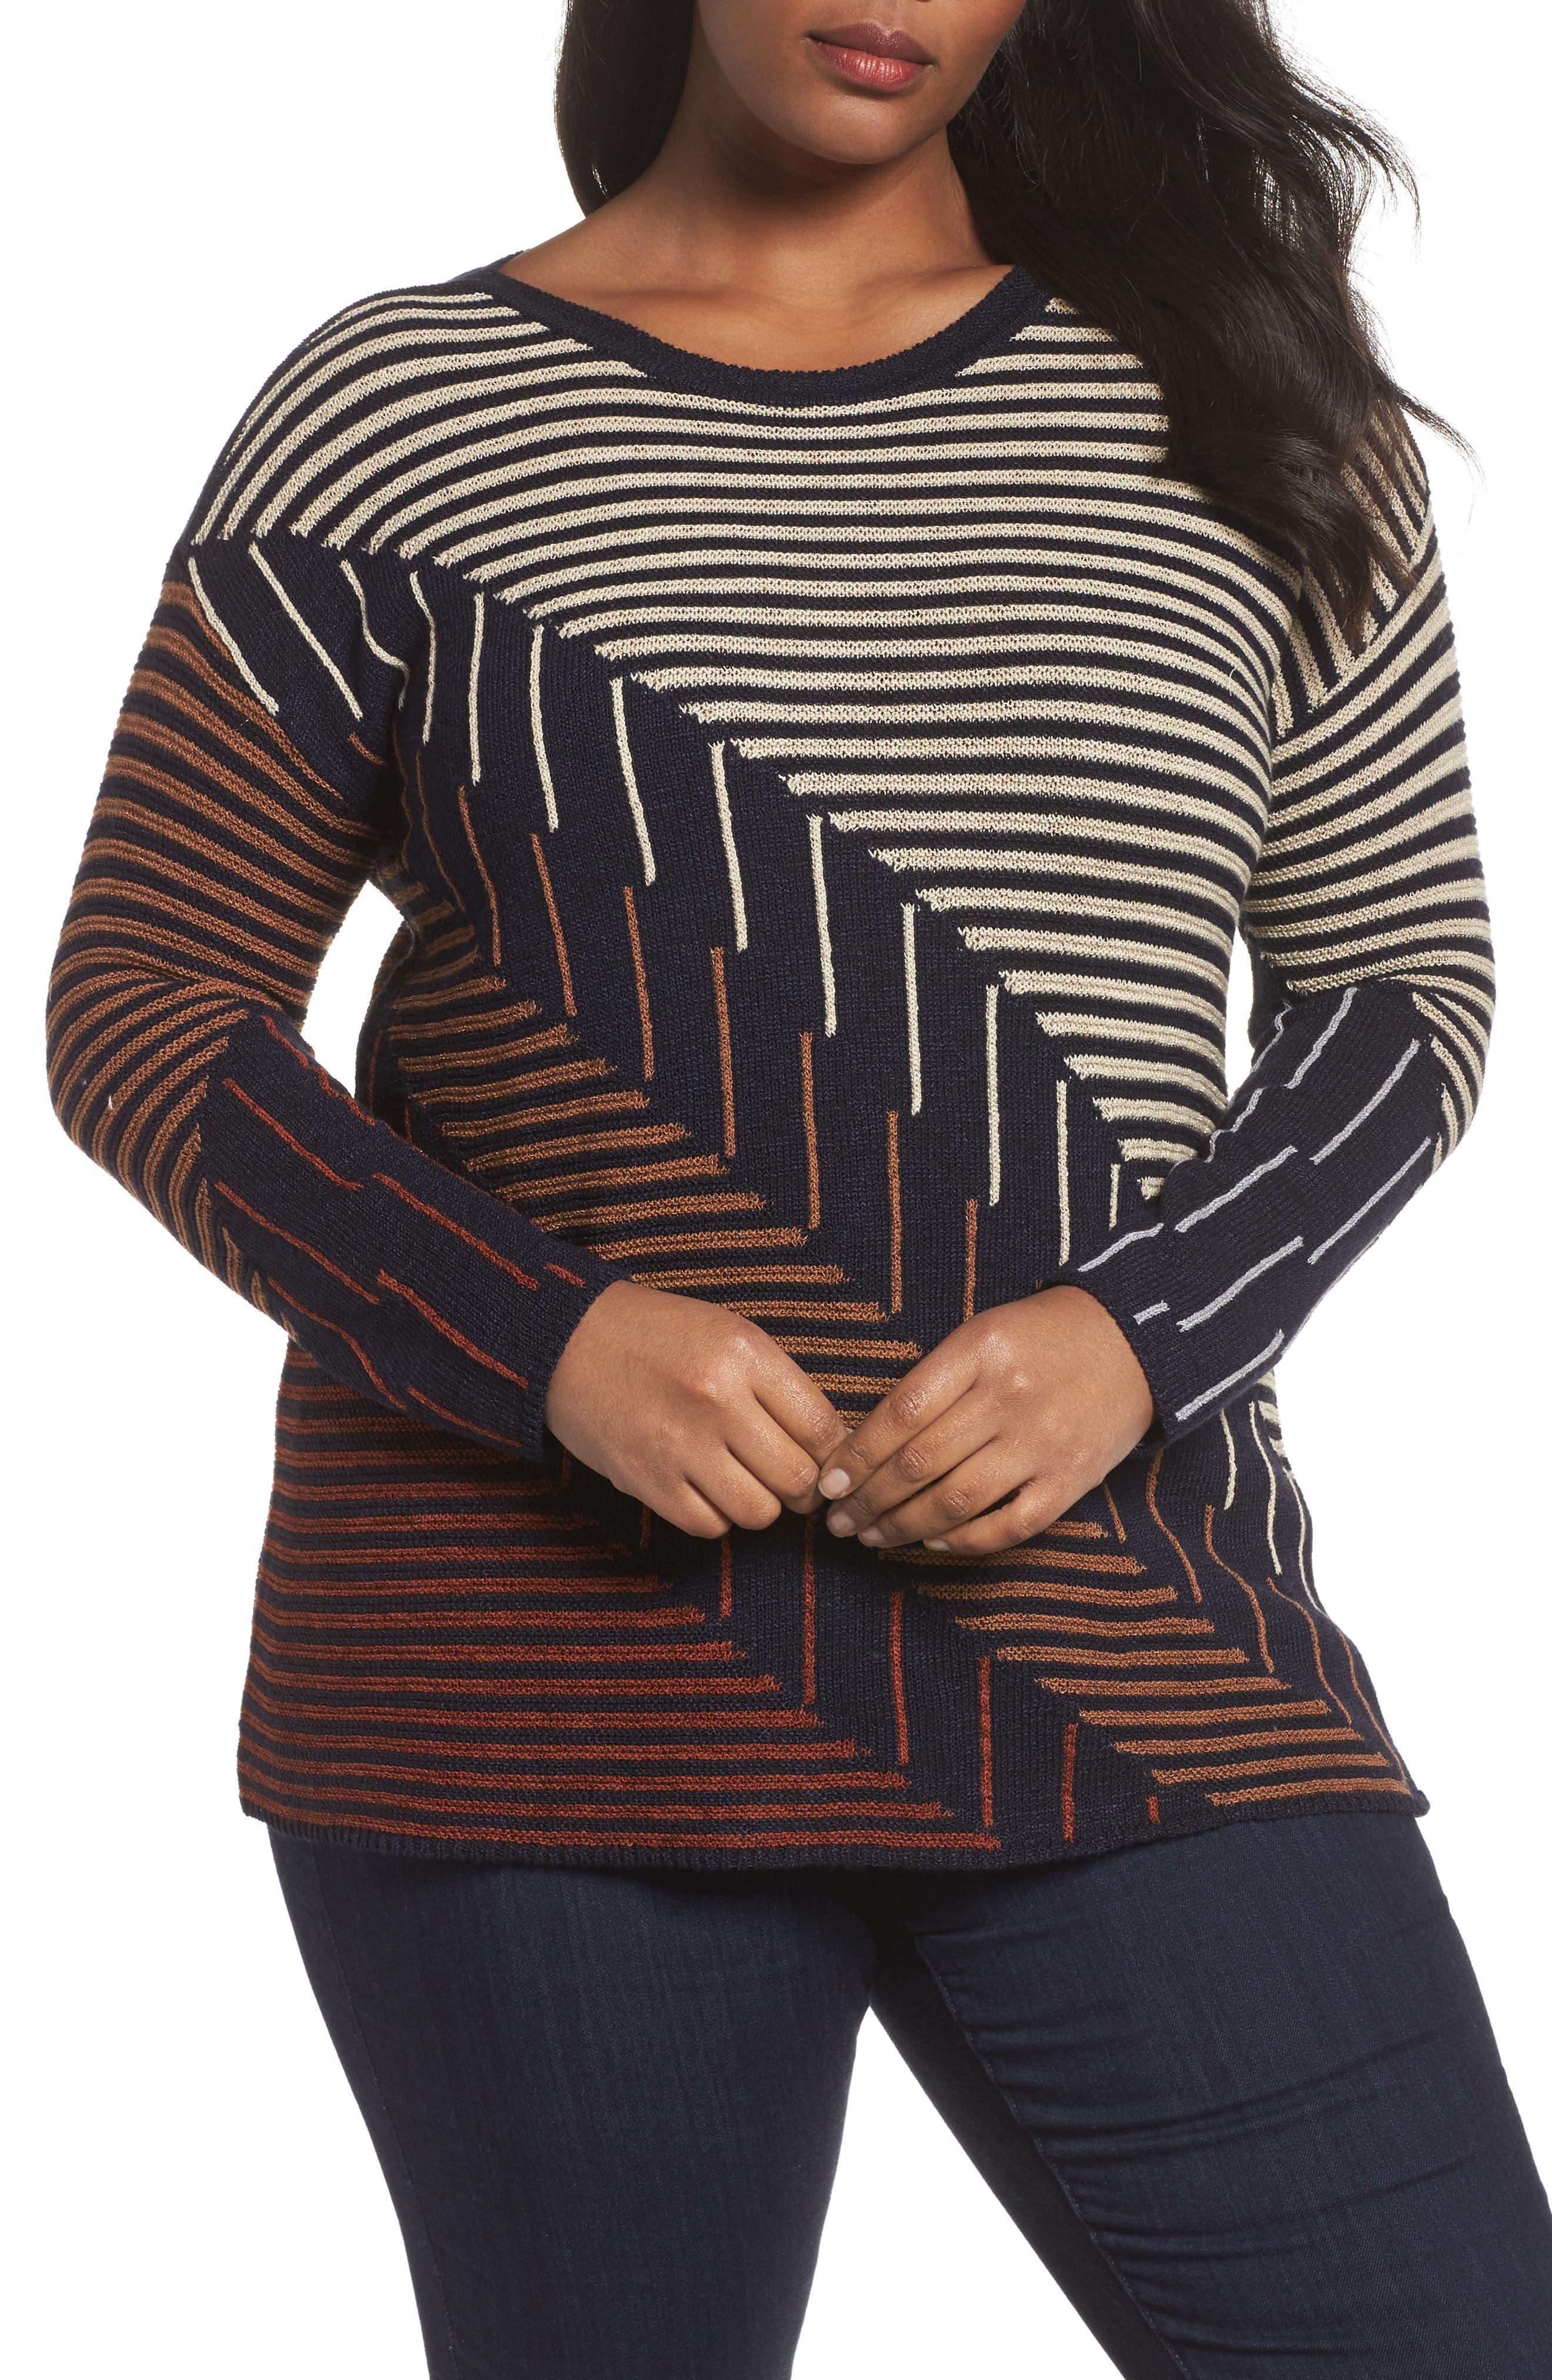 Lagoon Sweater,                         Main,                         color, Multi